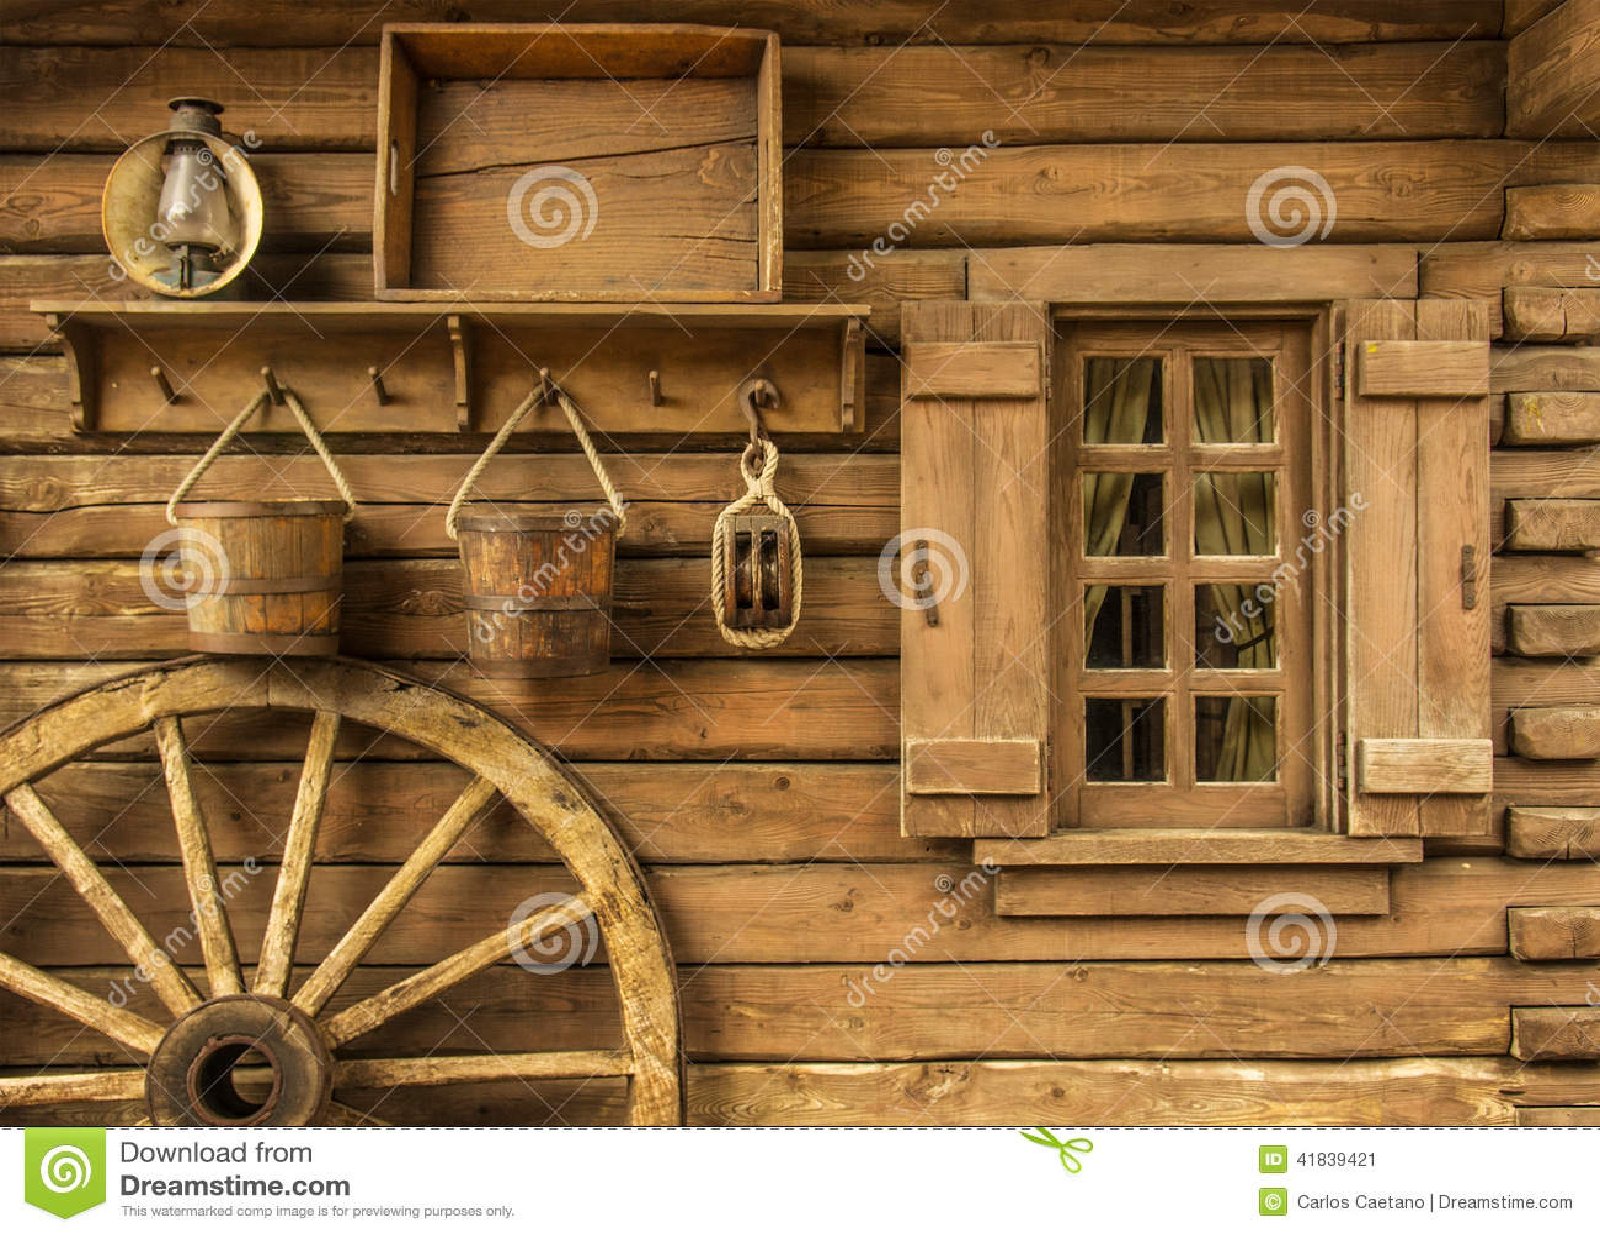 Rural Western Stock Photo Image 41839421